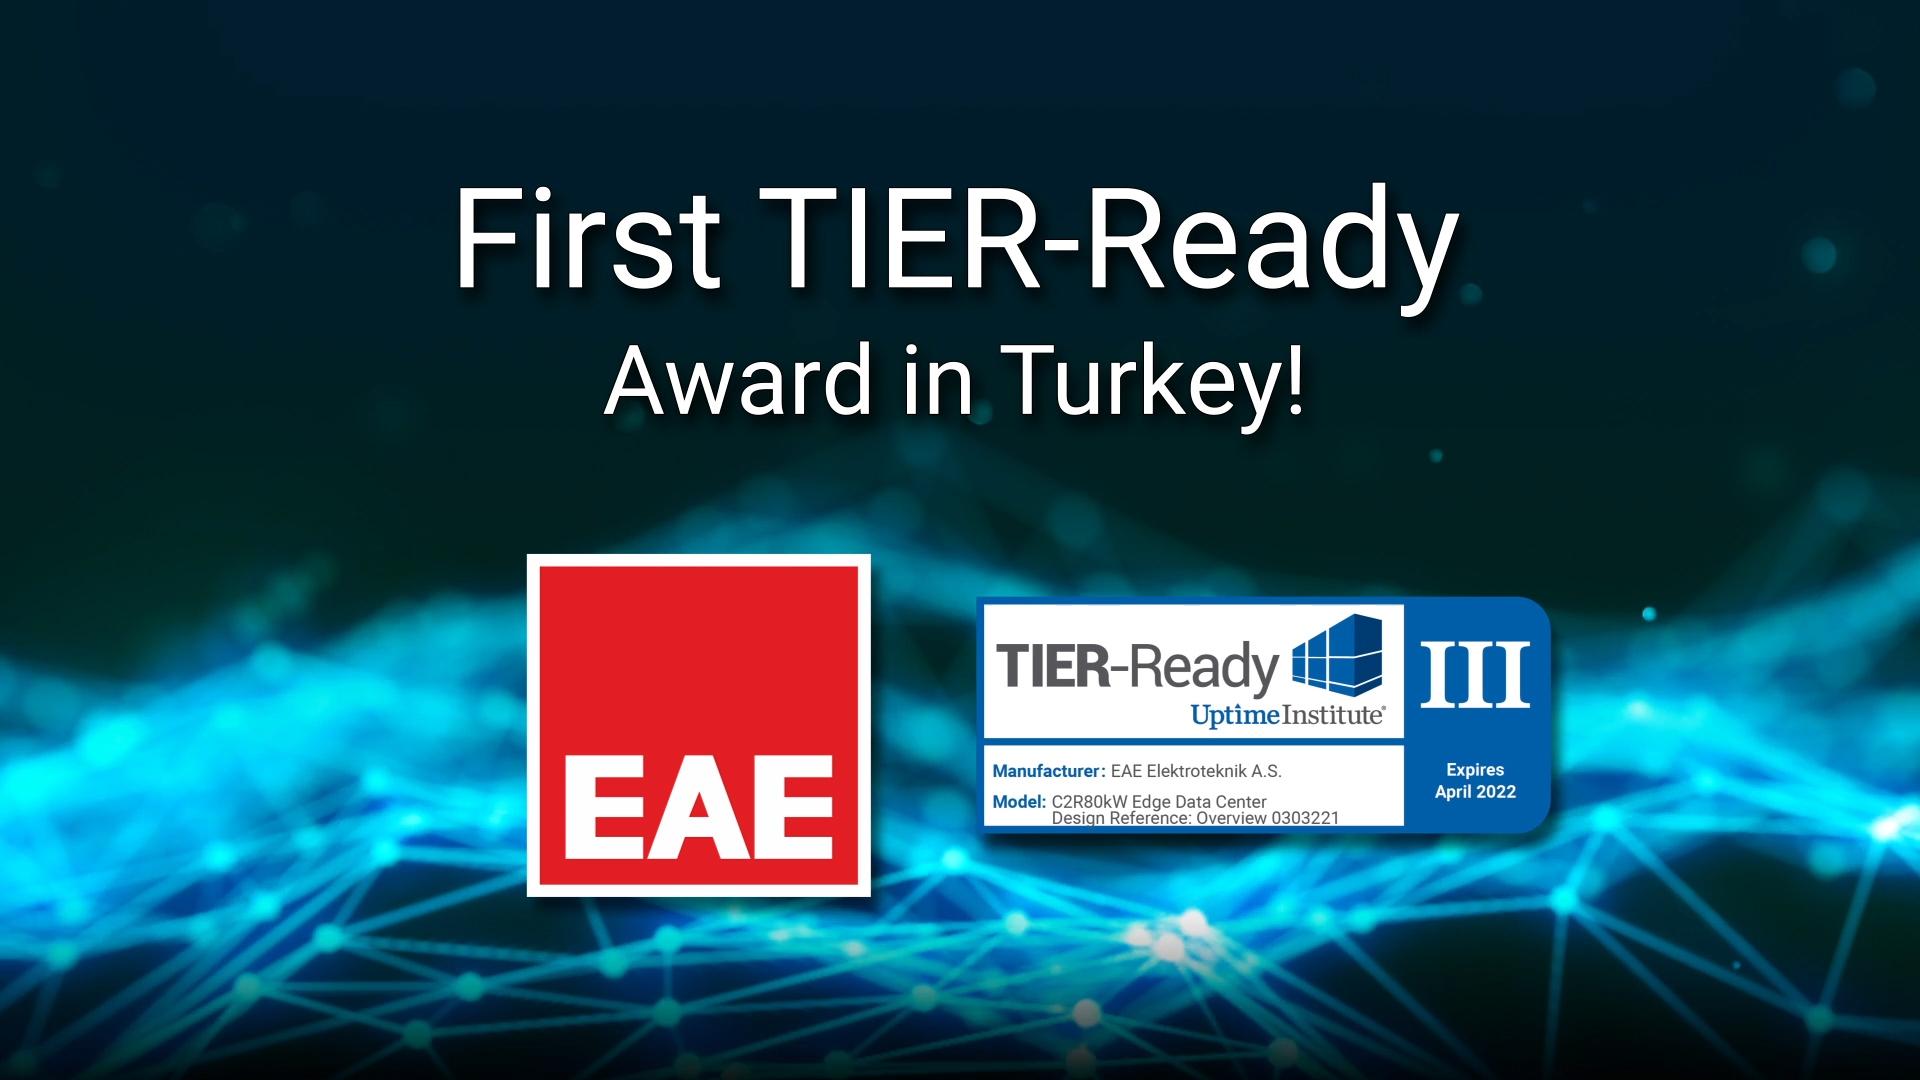 First TIER-Ready Award in Turkey!